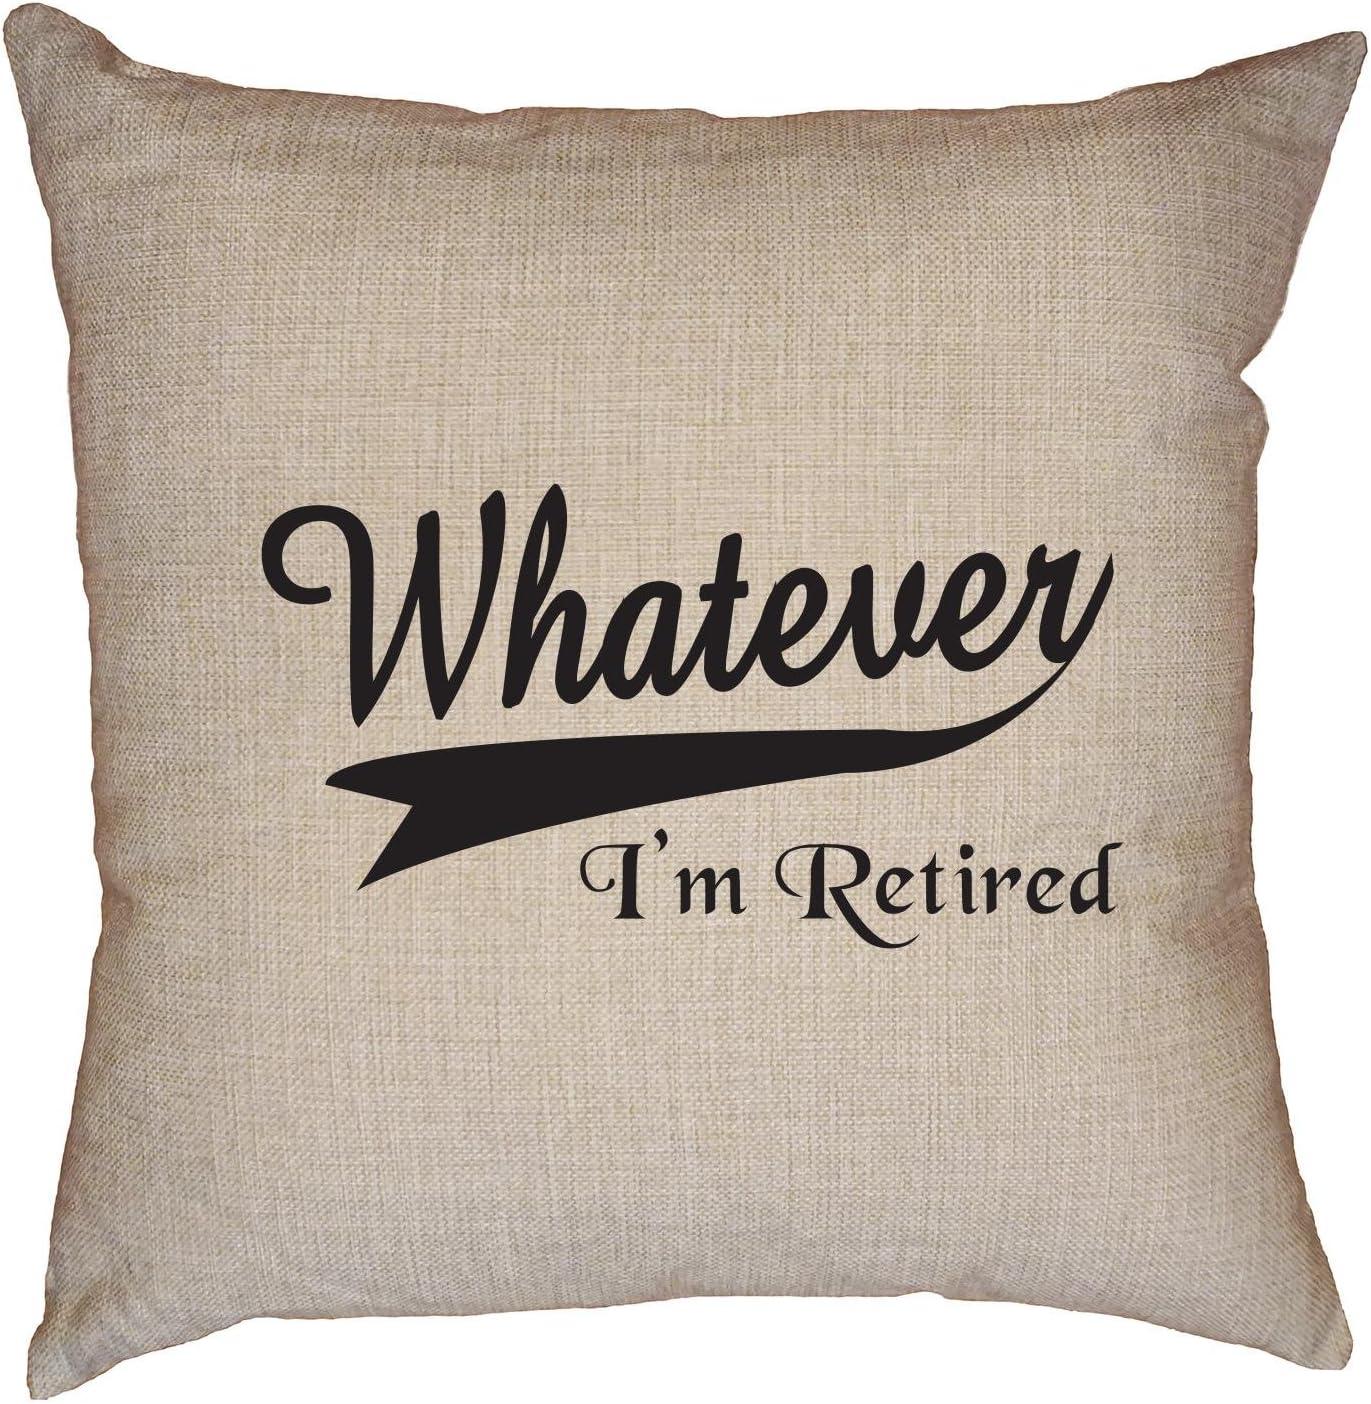 Import Whatever I'm Retired - favorite Hilarious L Decorative Graphic Retirement